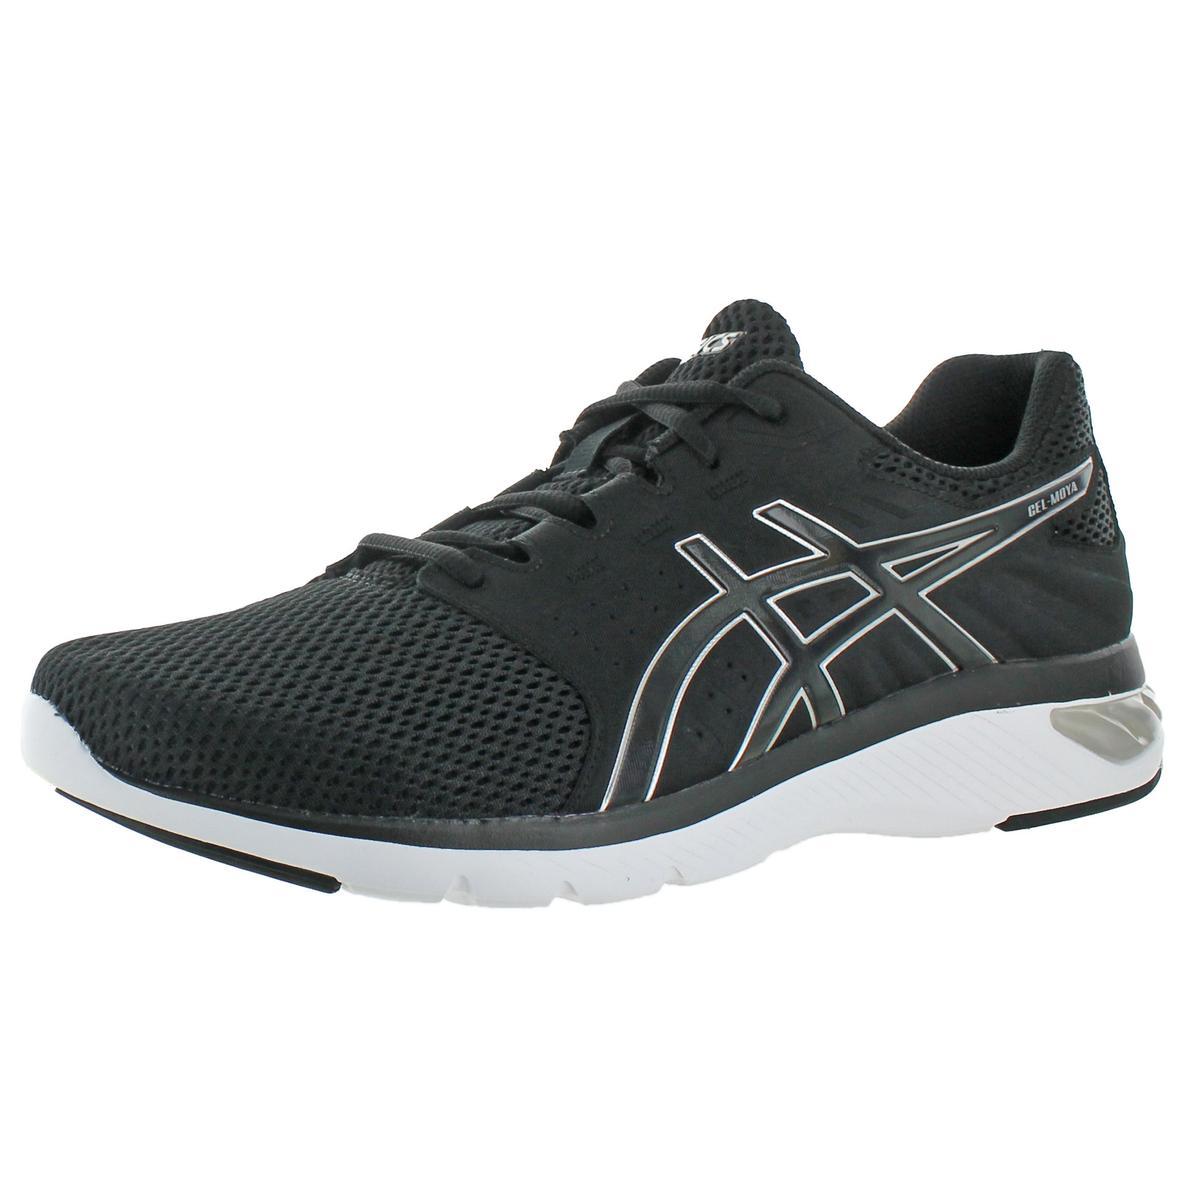 f1ae5b0bc5 Asics Mens GEL-Moya Lightweight Fitness Trainer Running Shoes ...